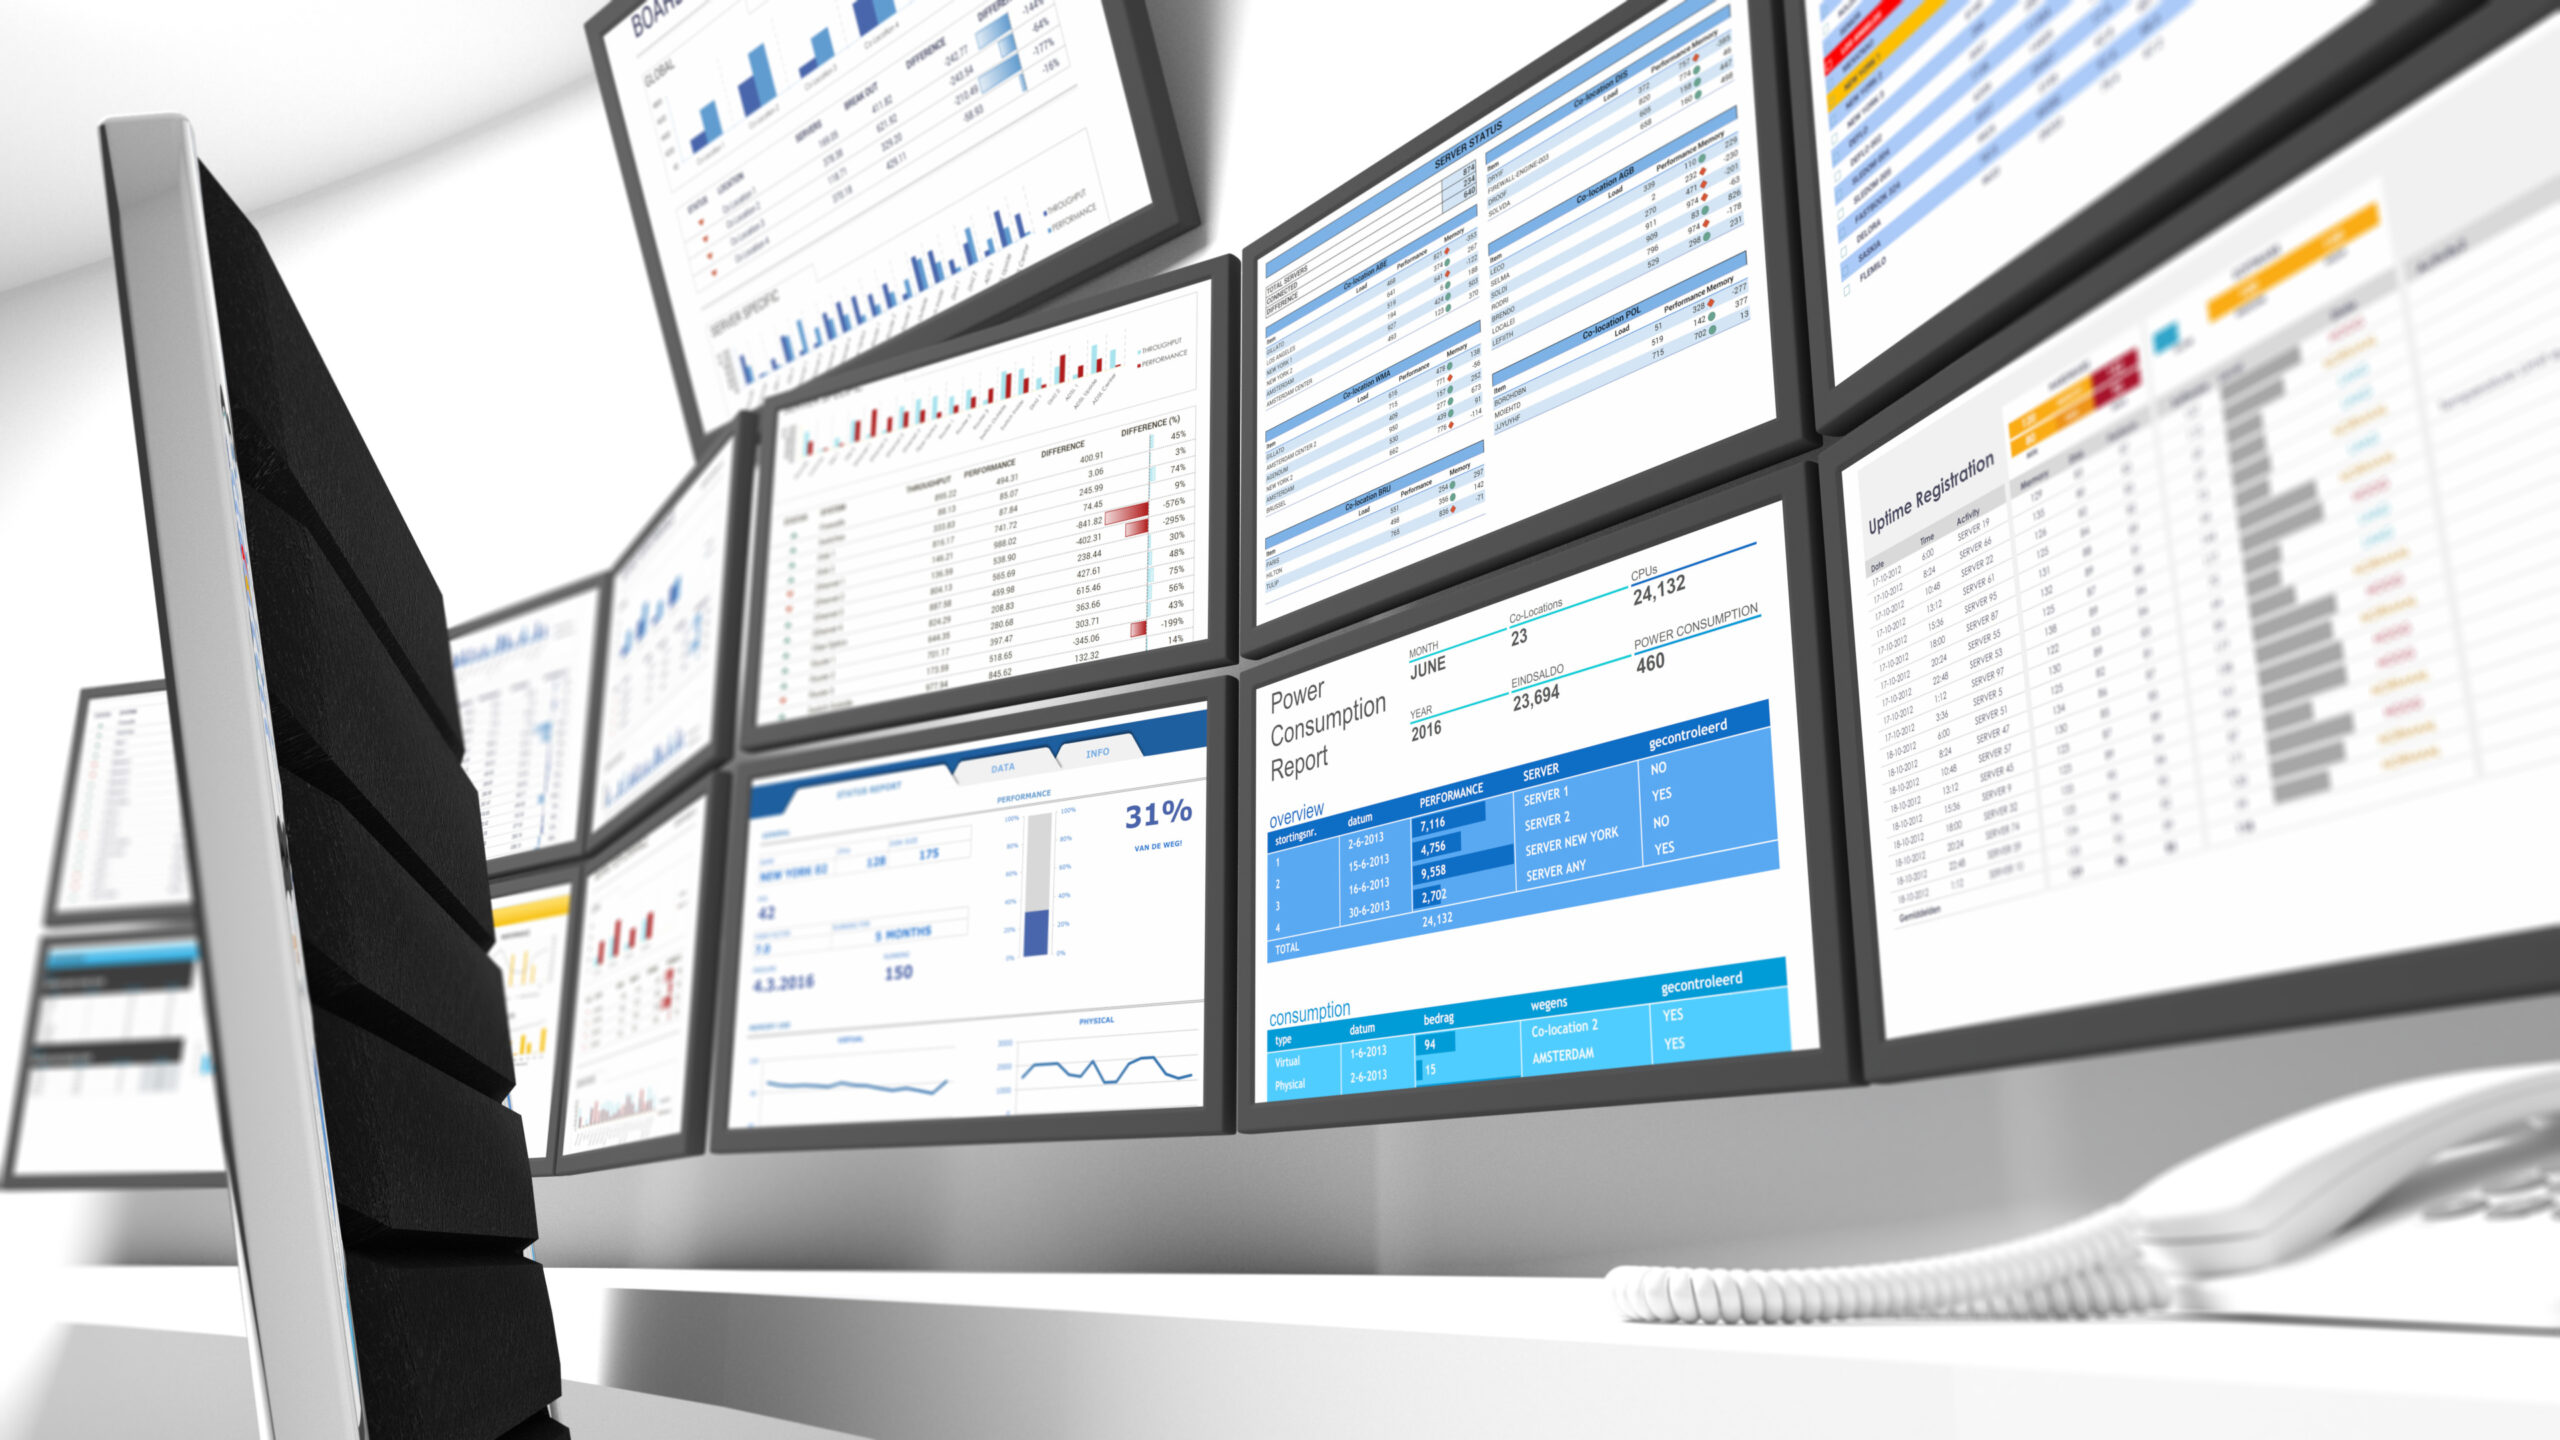 https://cit-program.com/wp-content/uploads/2021/07/soc_monitoring-scaled-1.jpeg